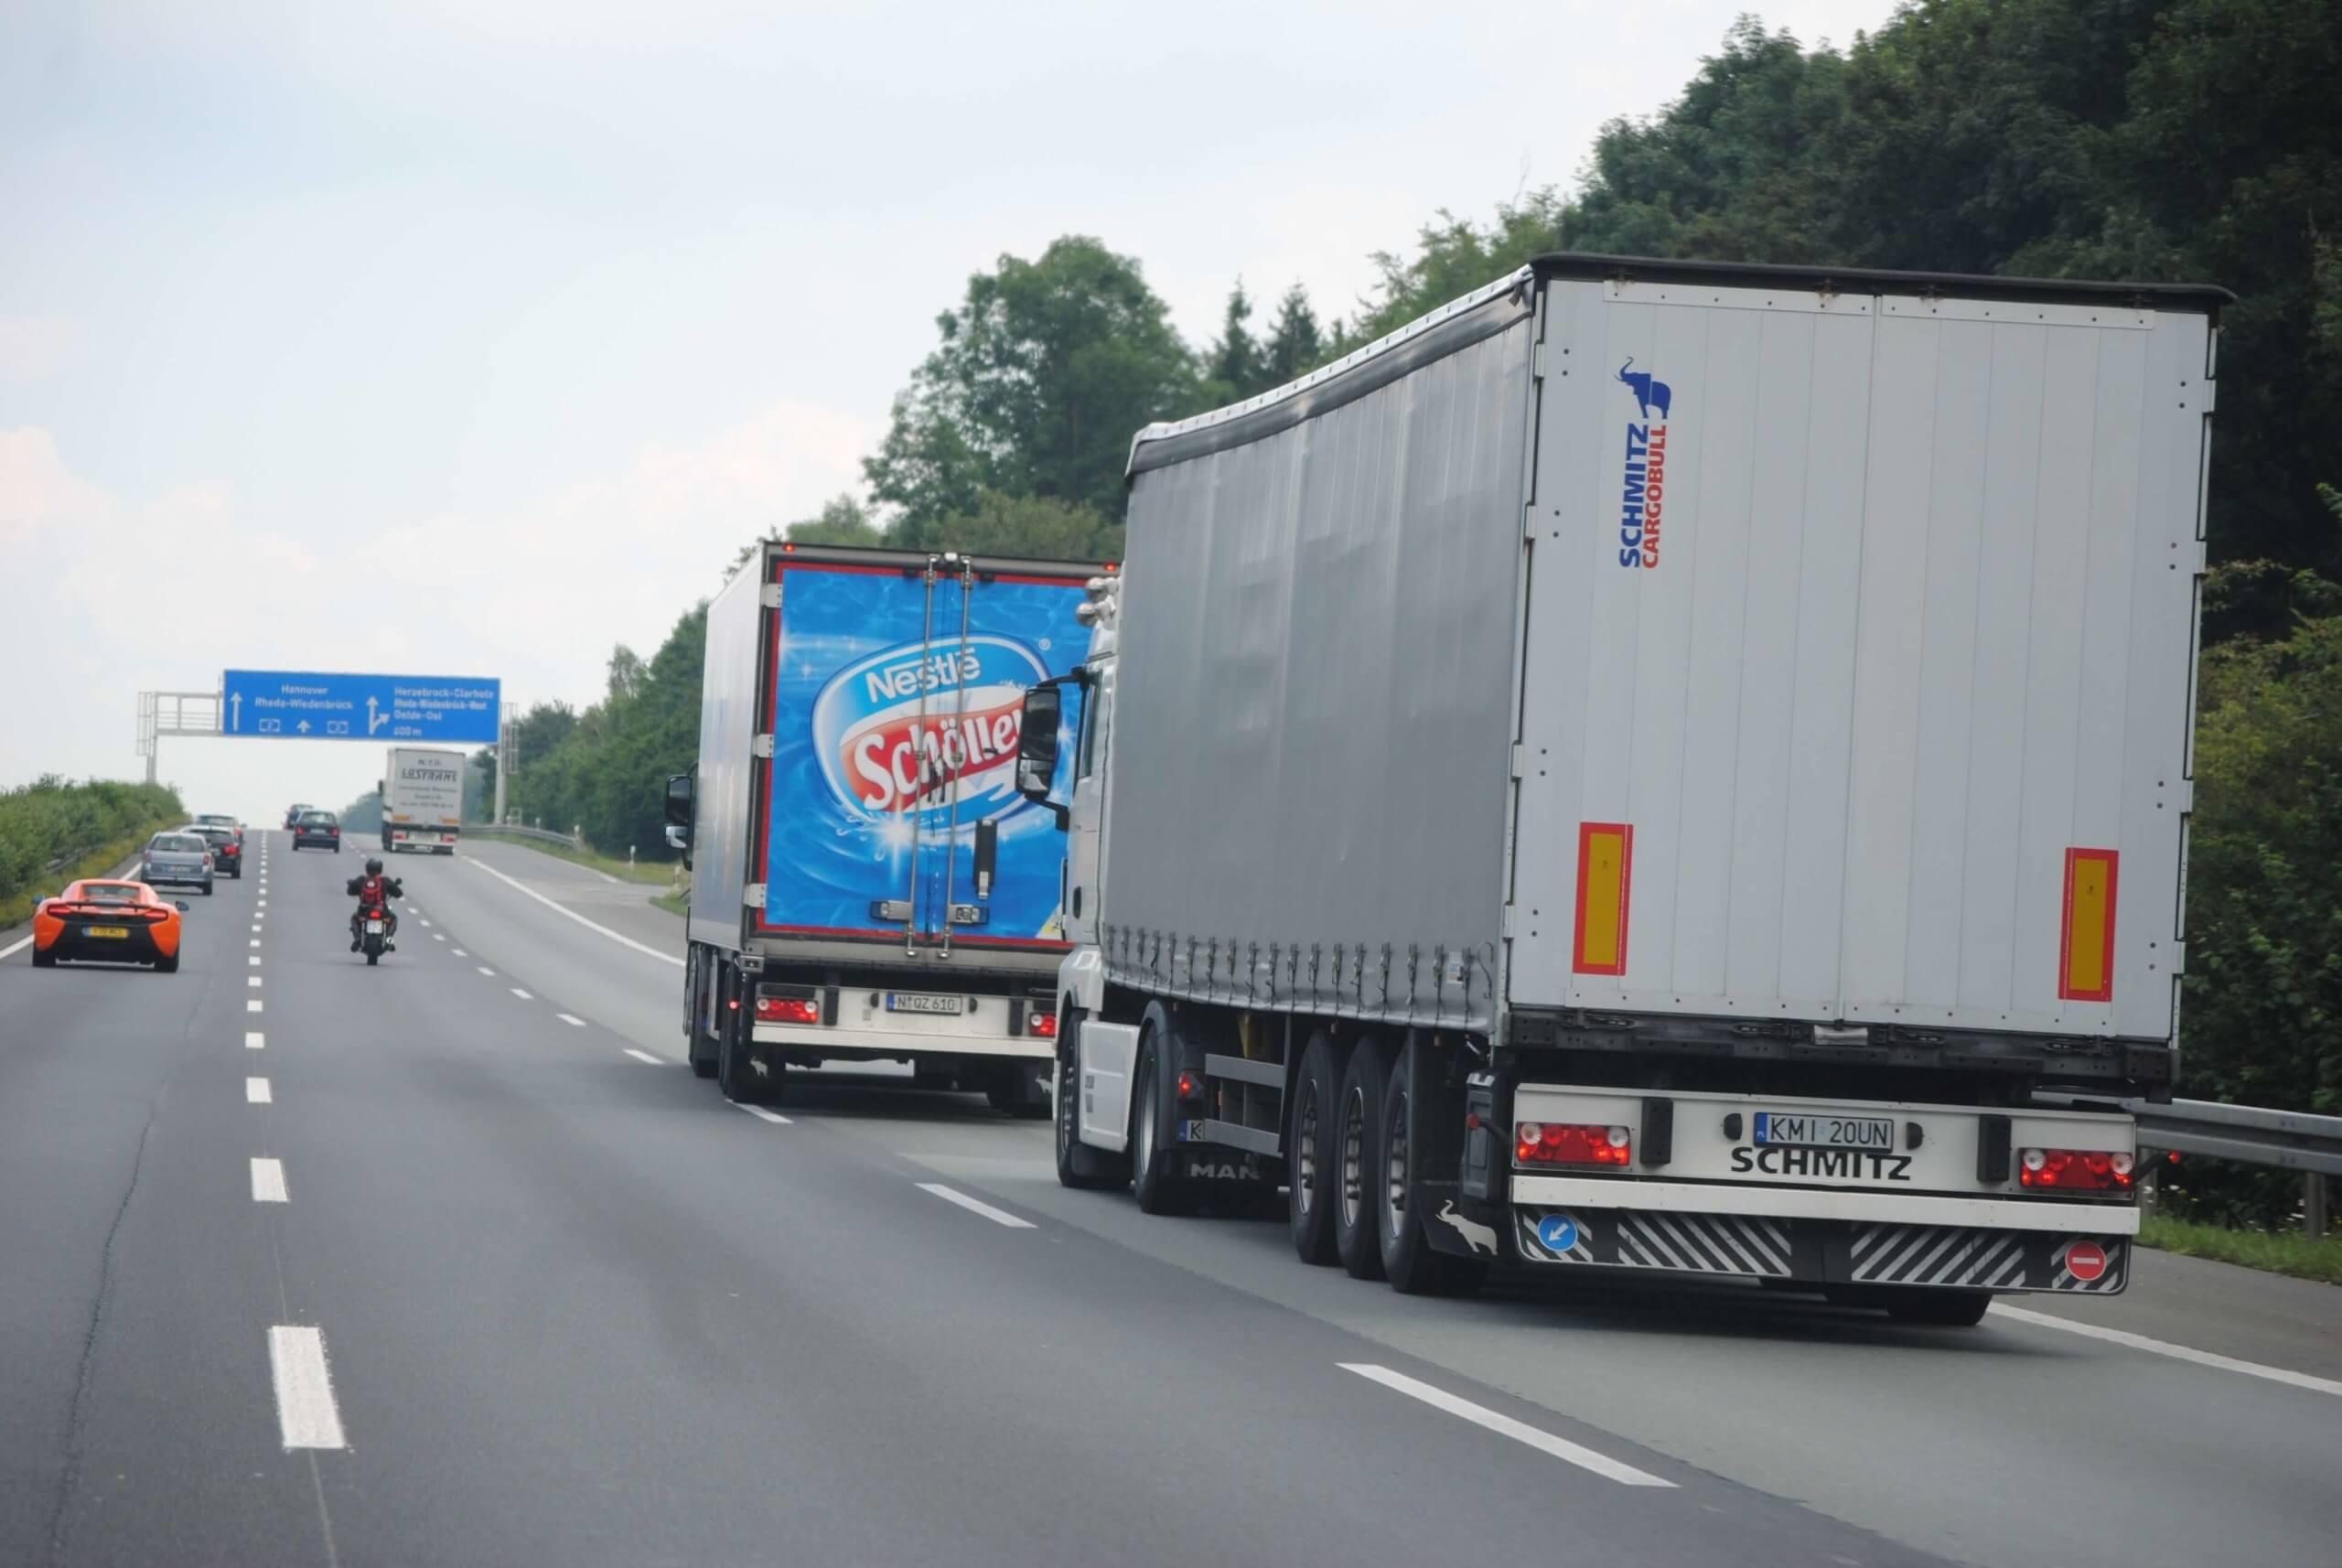 Fachkräftemangel in der Logistik (c) Sauerlaender / pixabay.de